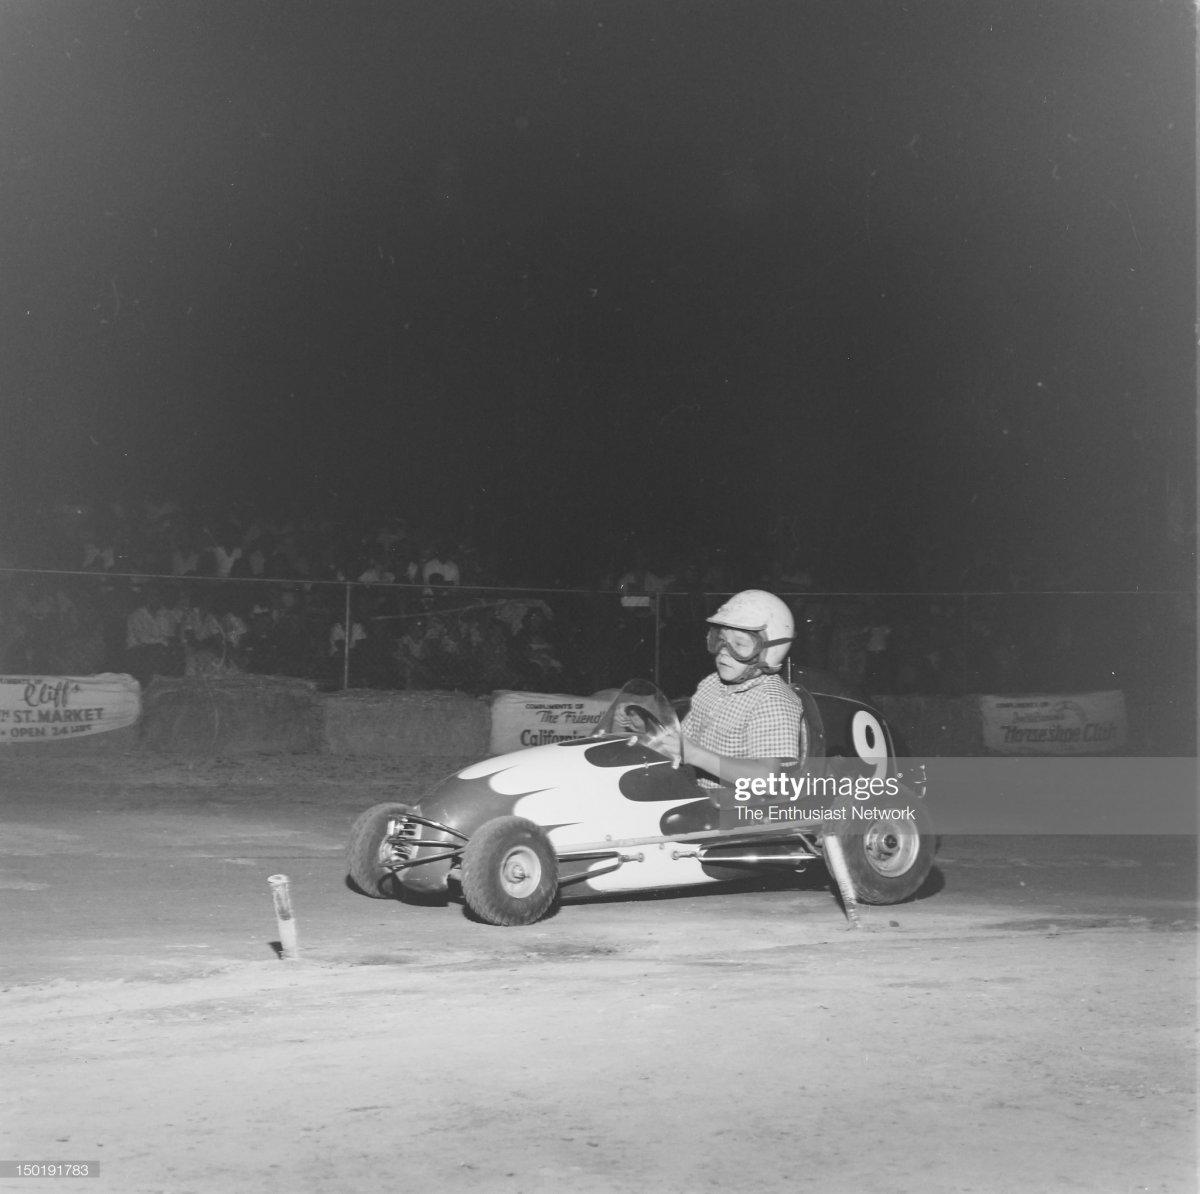 60 1956  Quarter Midgets at Las Vegas.3.jpg